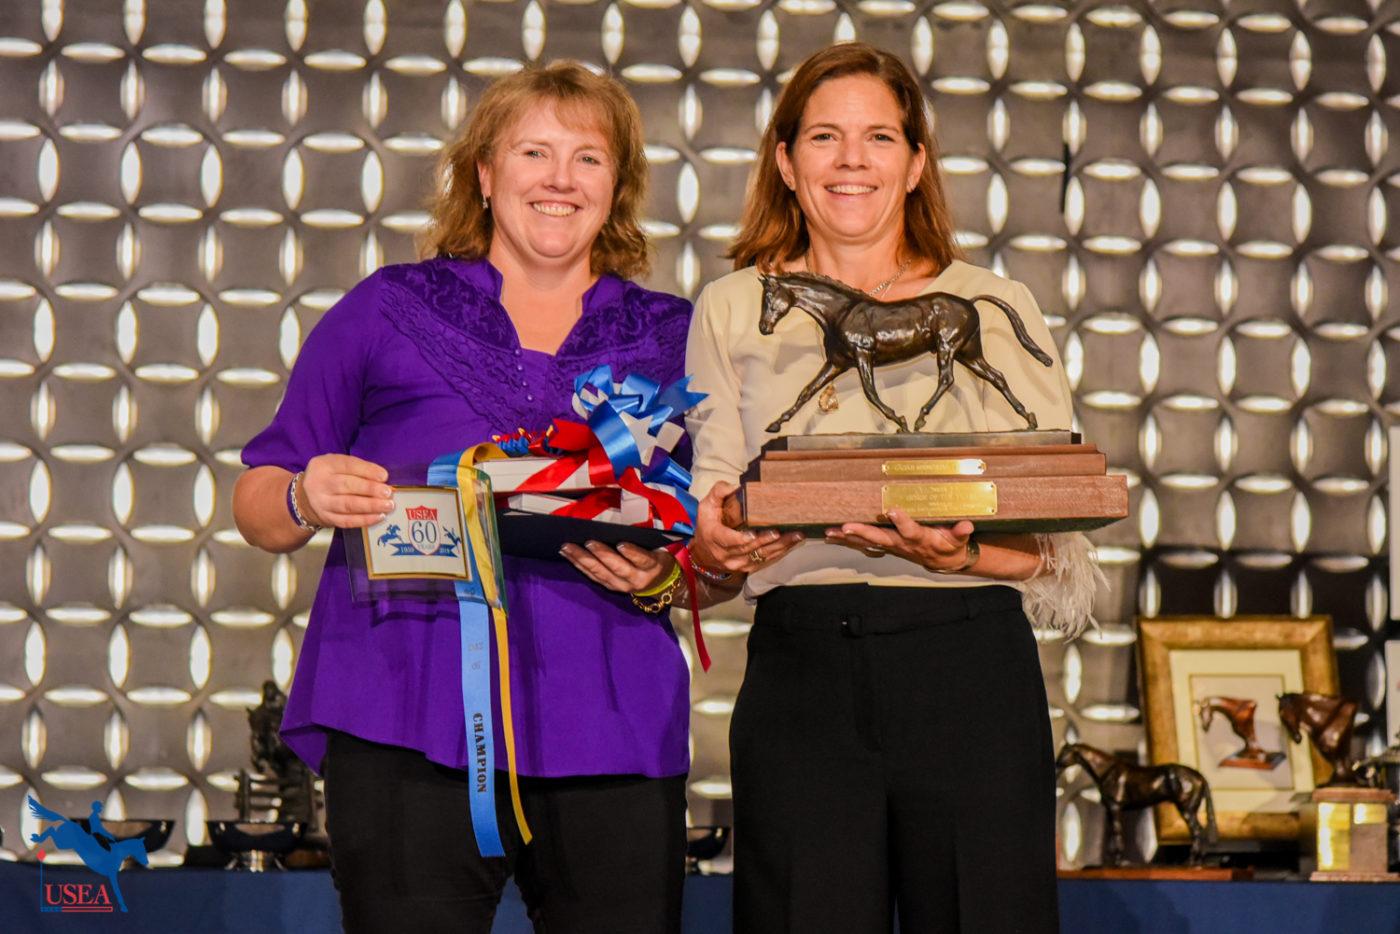 Sarah Pyne and Call Me Commander. USEA/Jessica Duffy Photo.